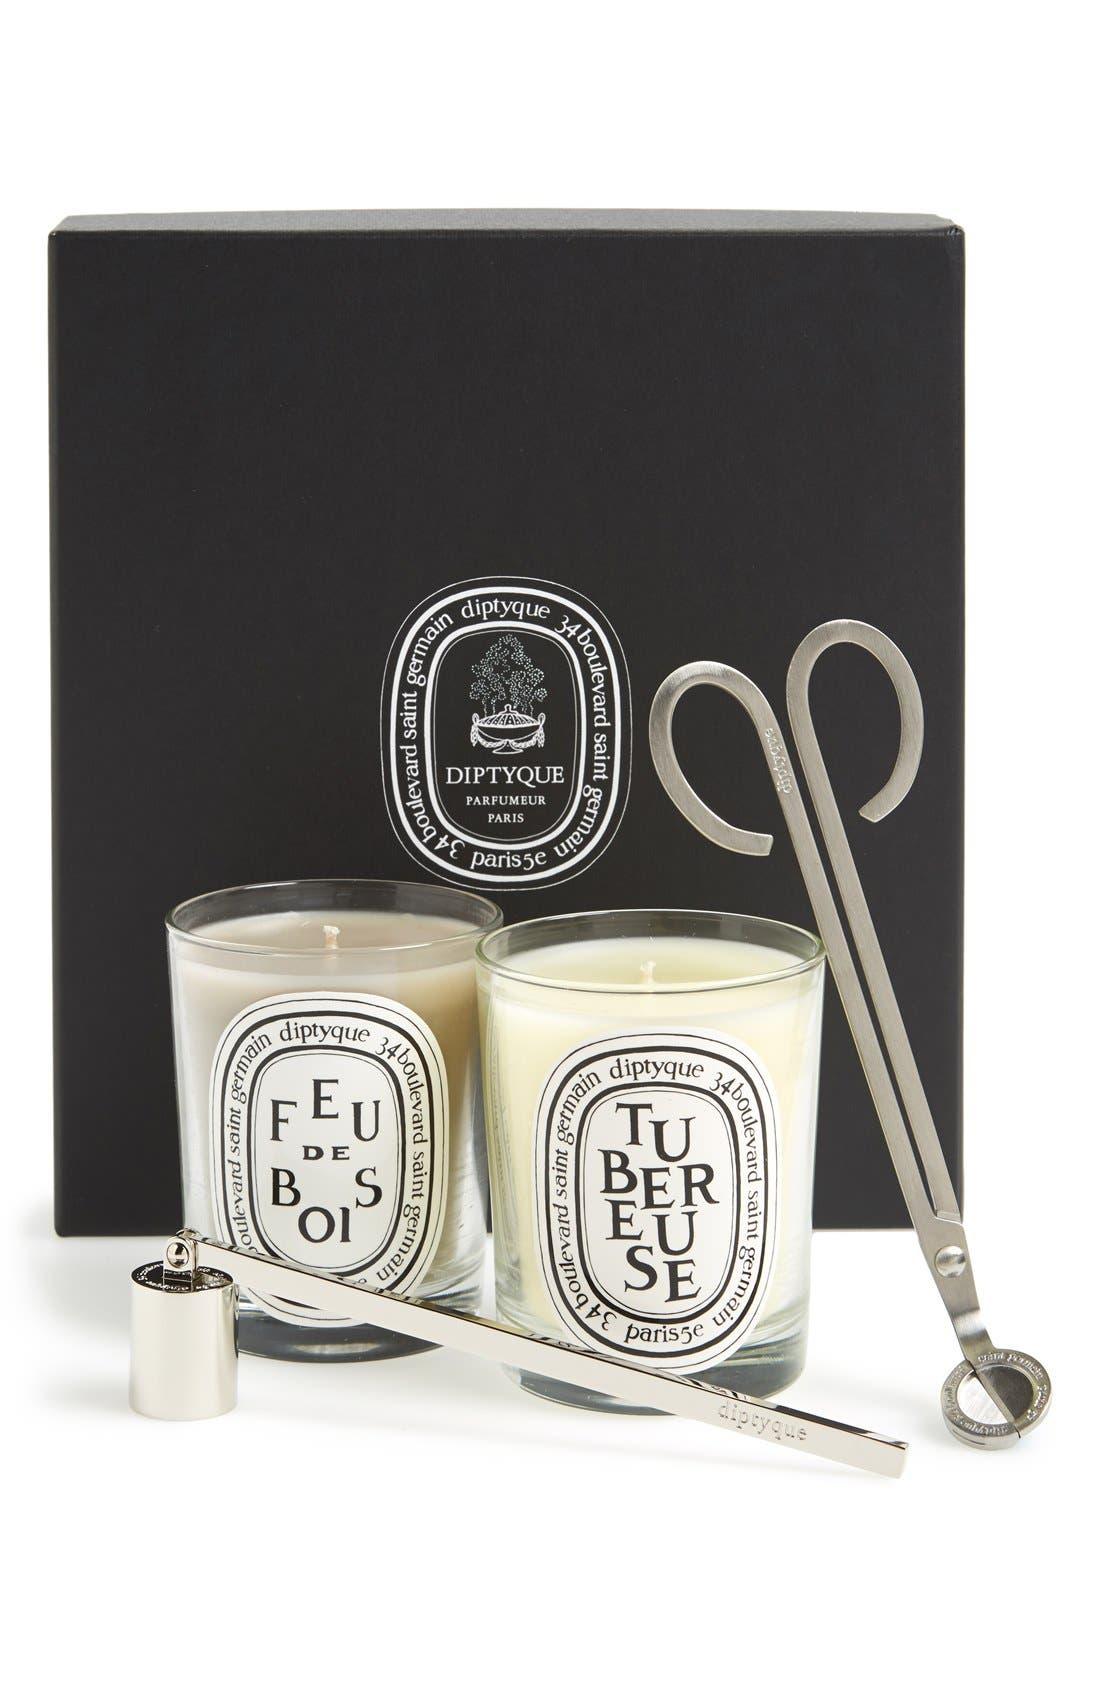 Alternate Image 1 Selected - diptyque 'Tubereuse & Feu de Bois' Candle Set ($196 Value)